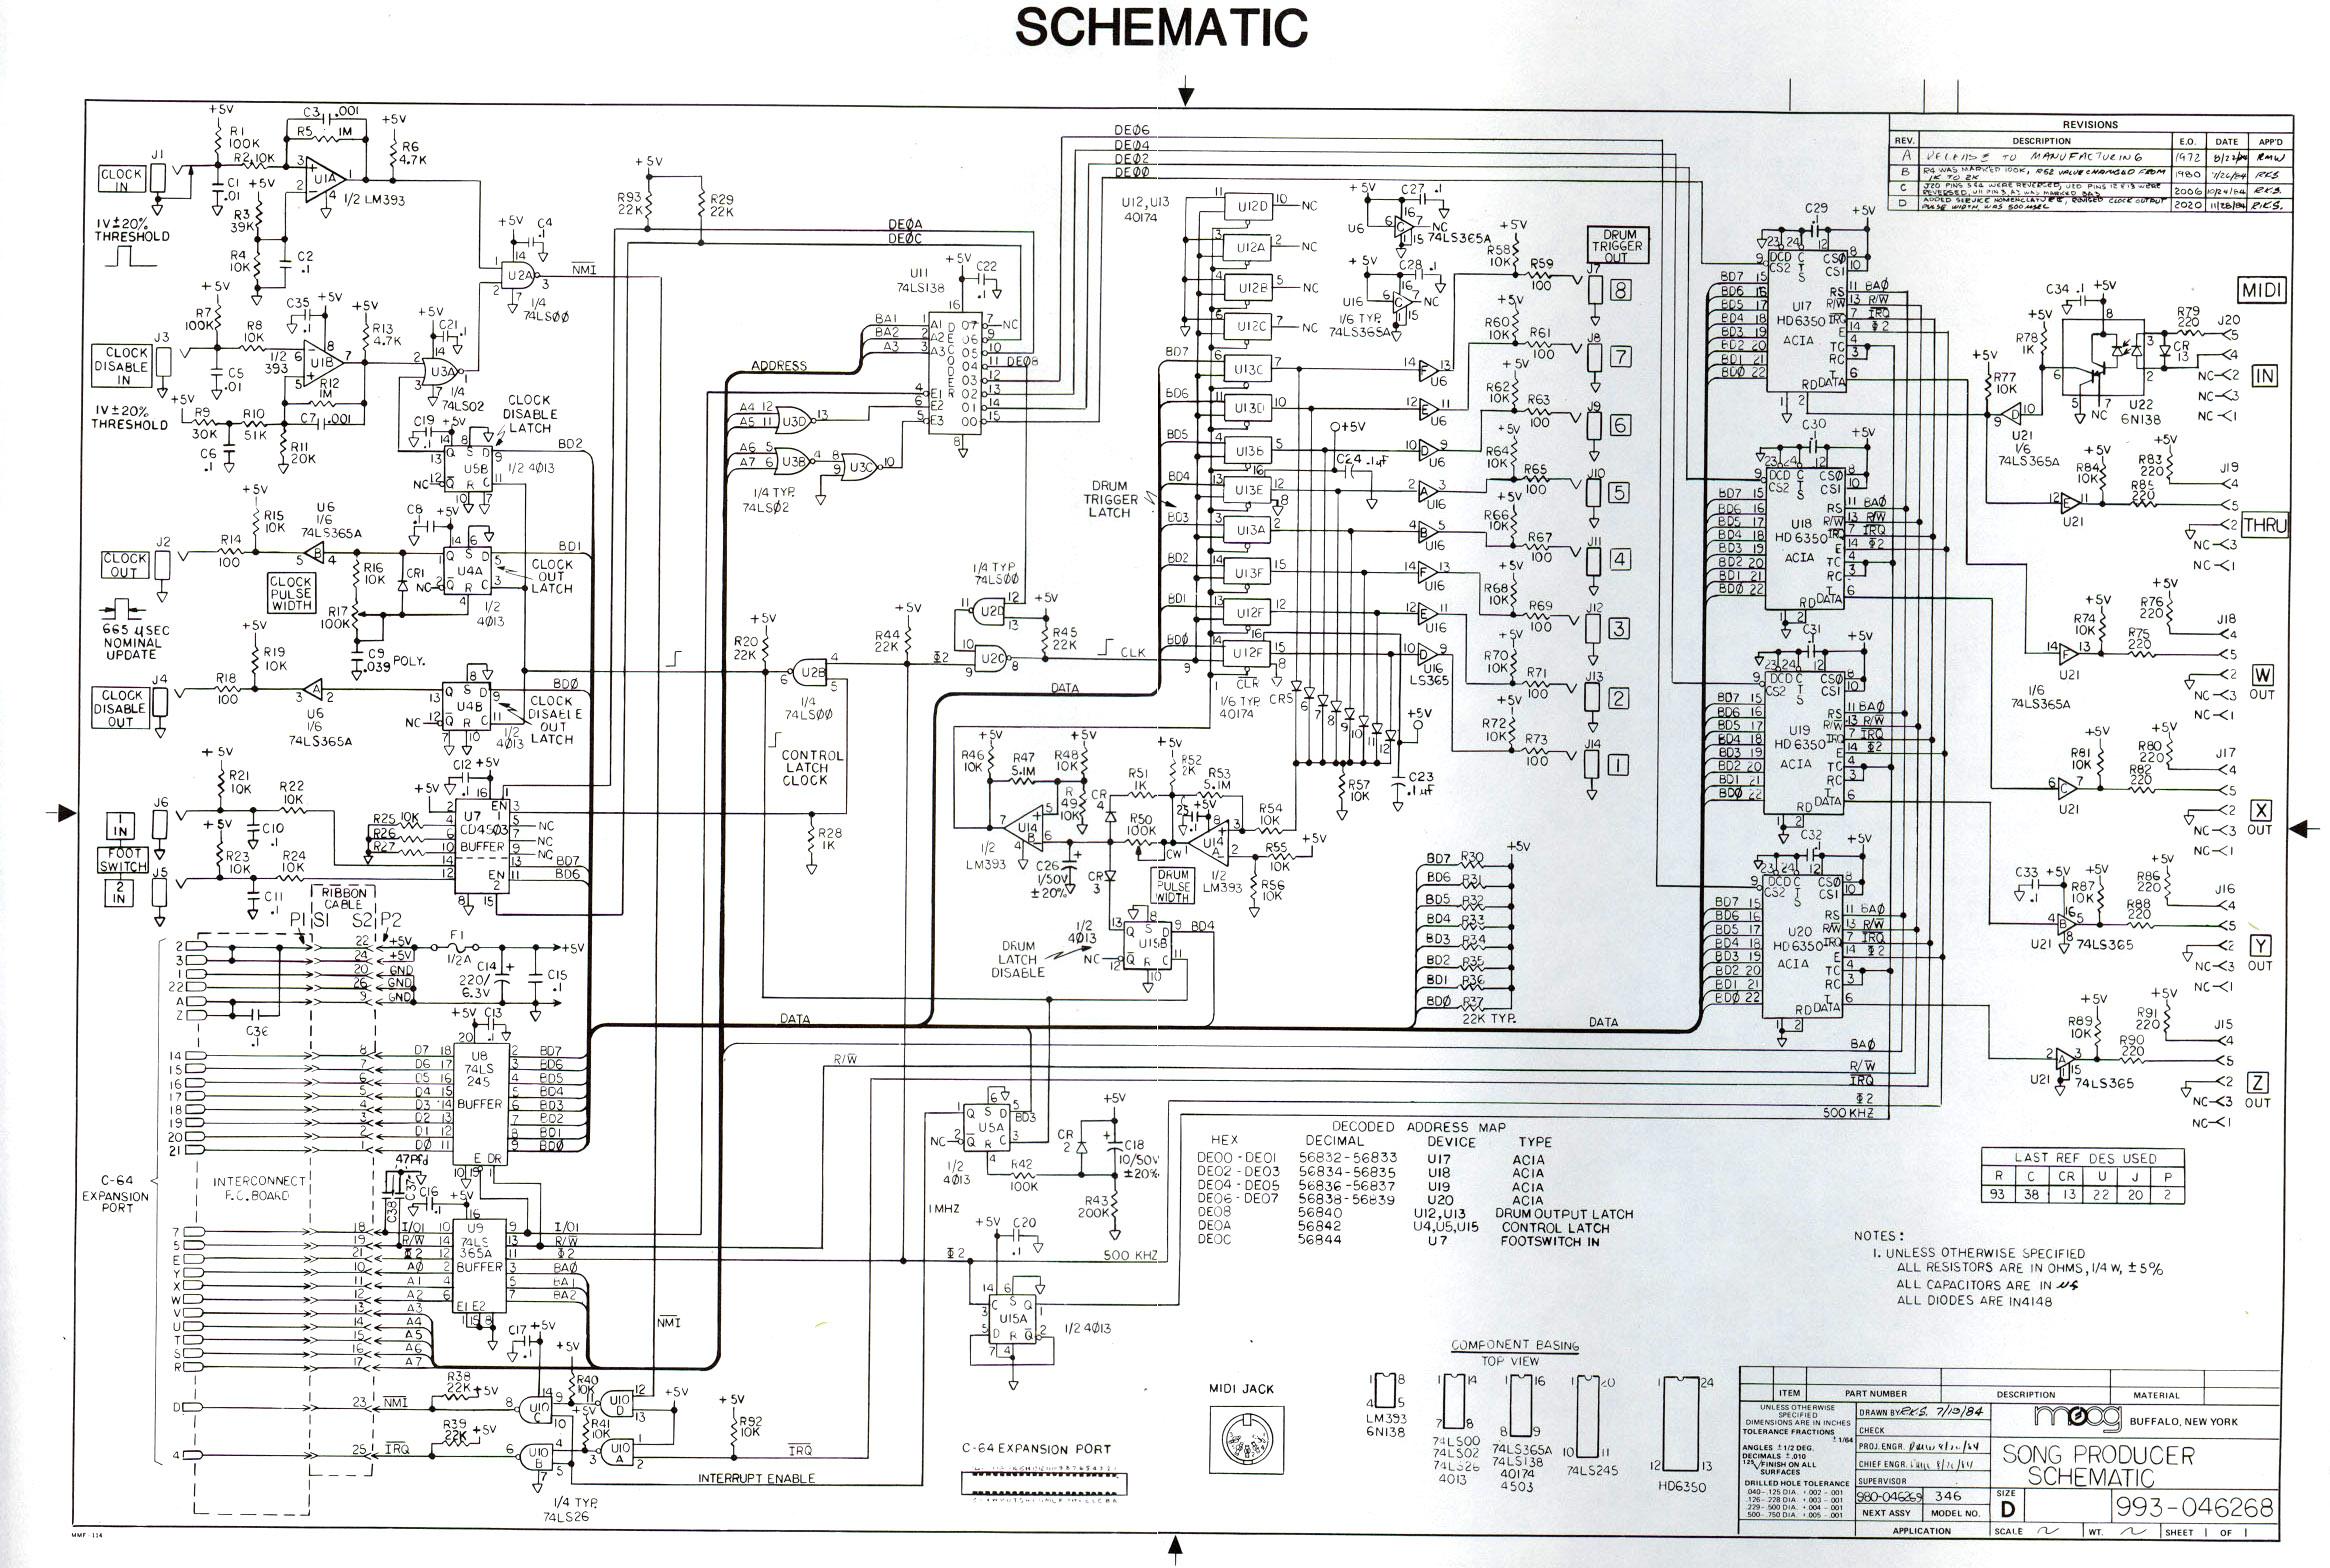 Synthfooldocsmoog Moog Taurus Schematics 2 Song Producer 908k